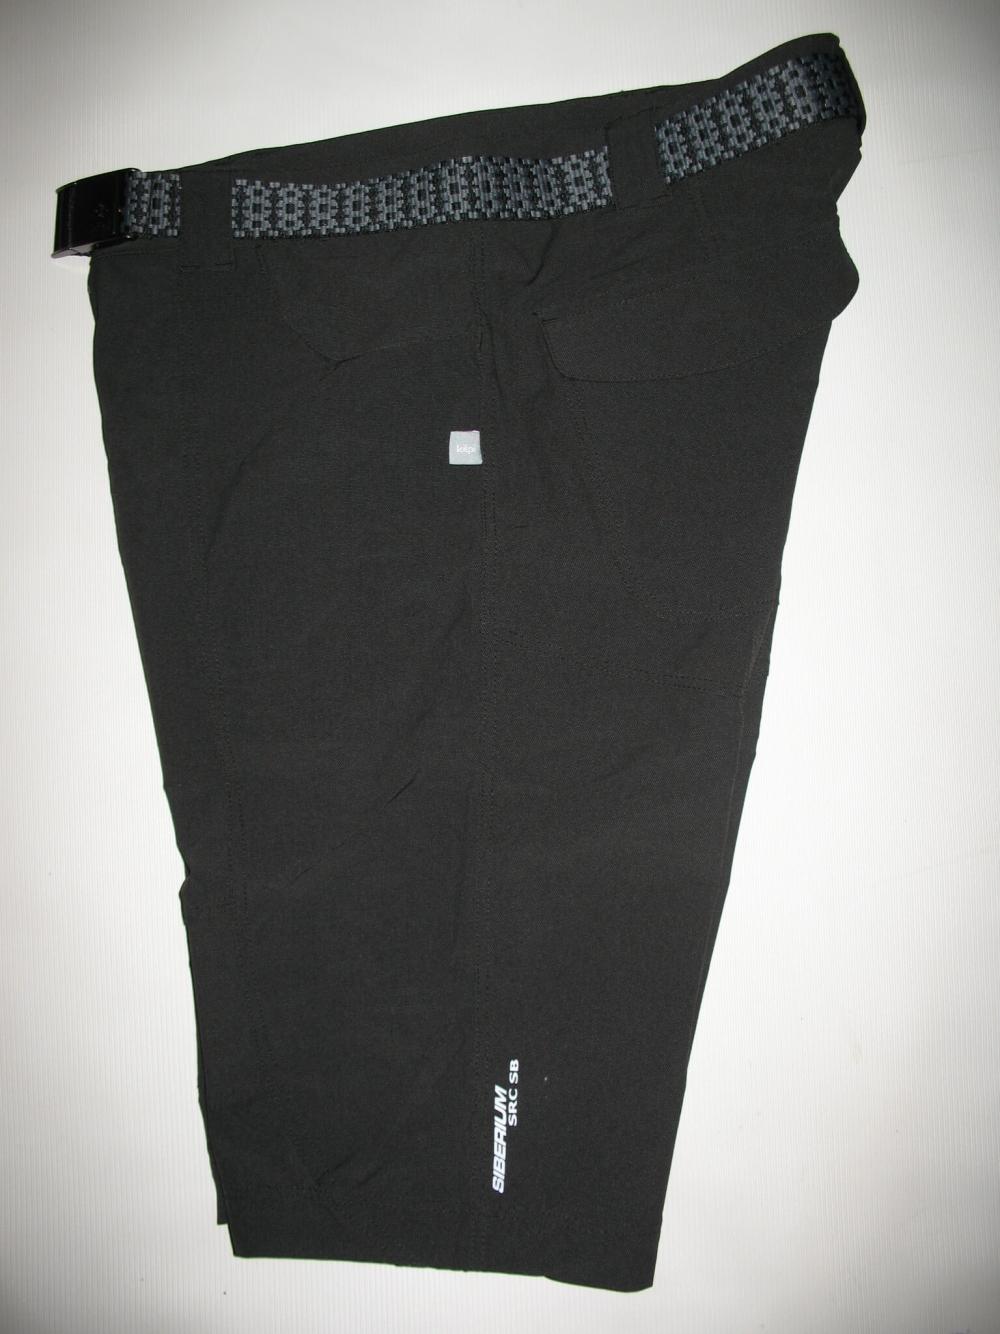 Шорты KILPI siberium src sb shorts lady (размер 36/S) - 3